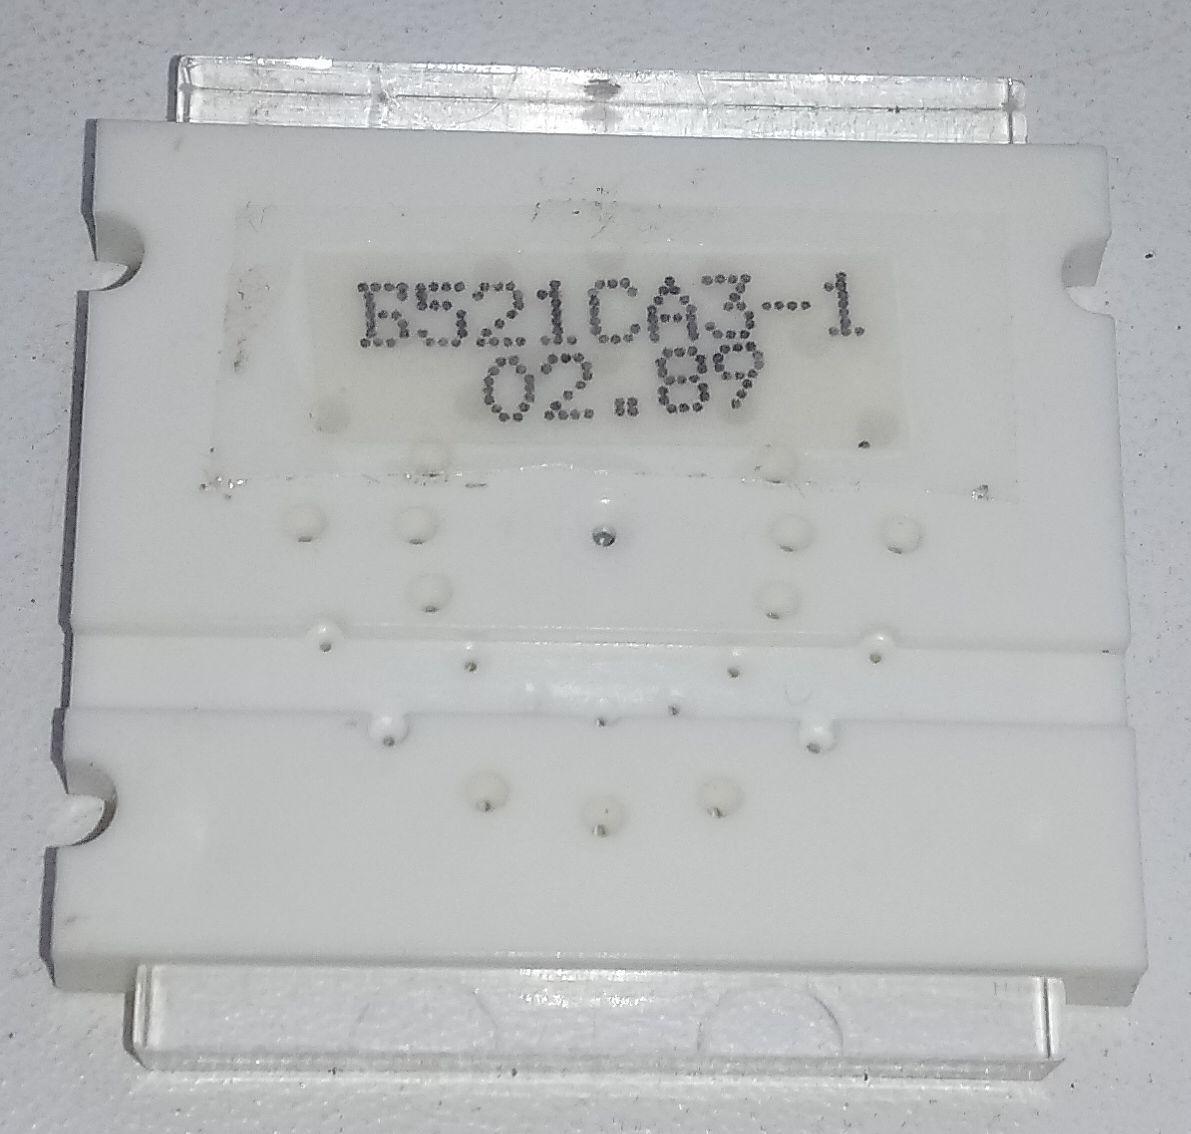 микросхема Б521СА3-2